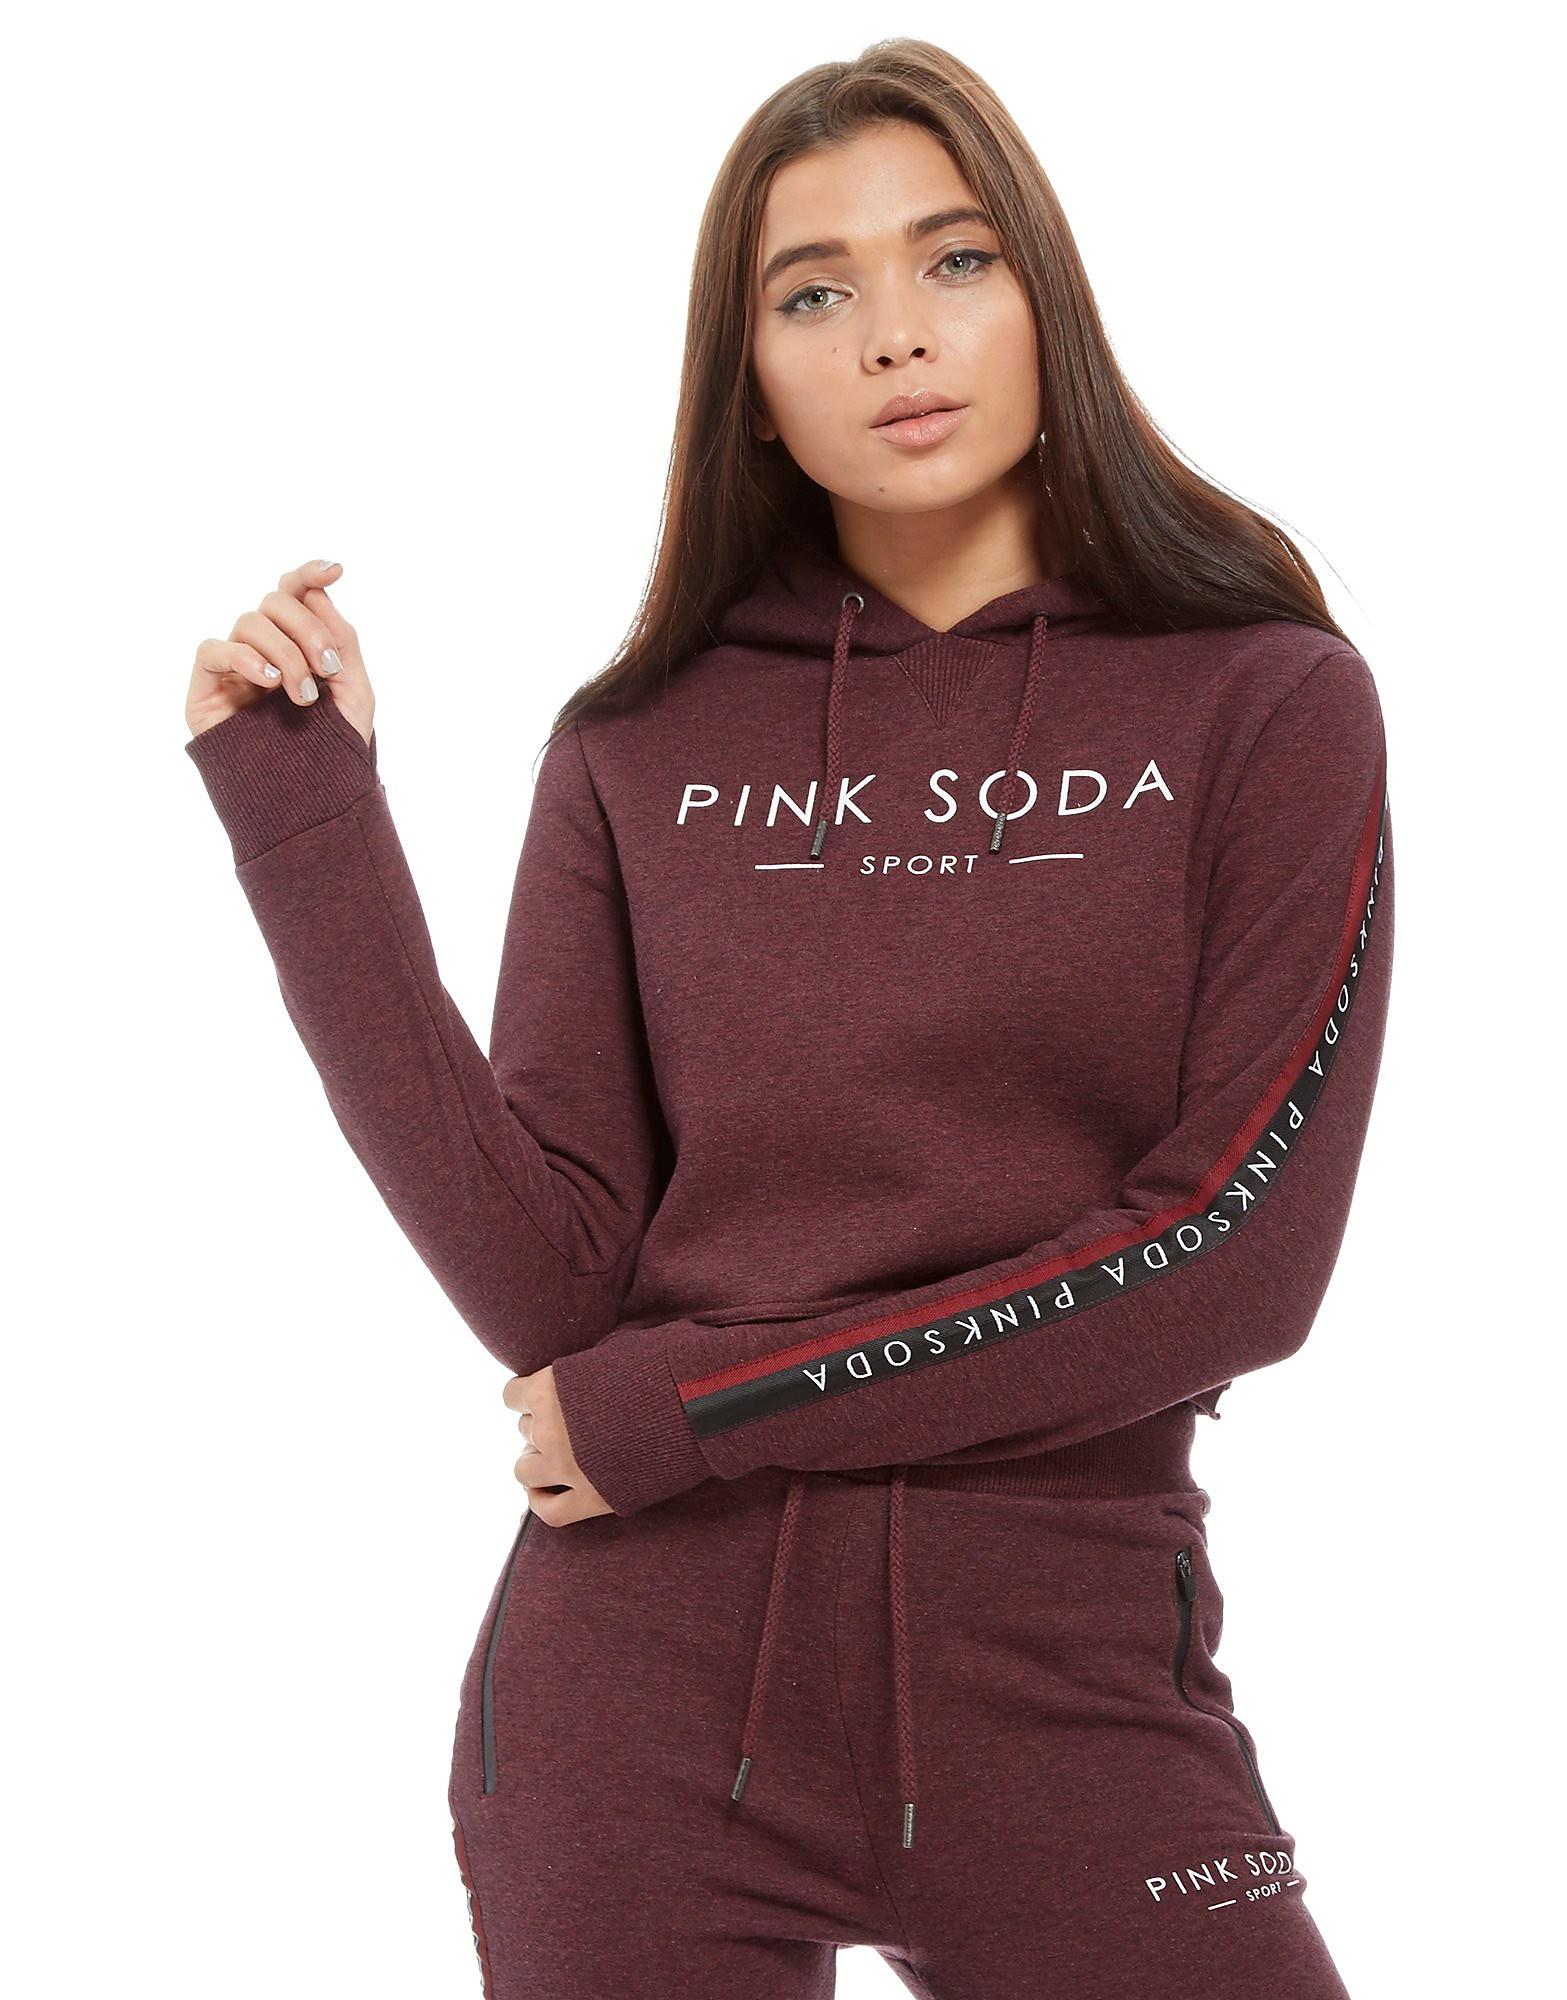 Pink Soda Sport Cropped Overhead Hoodie